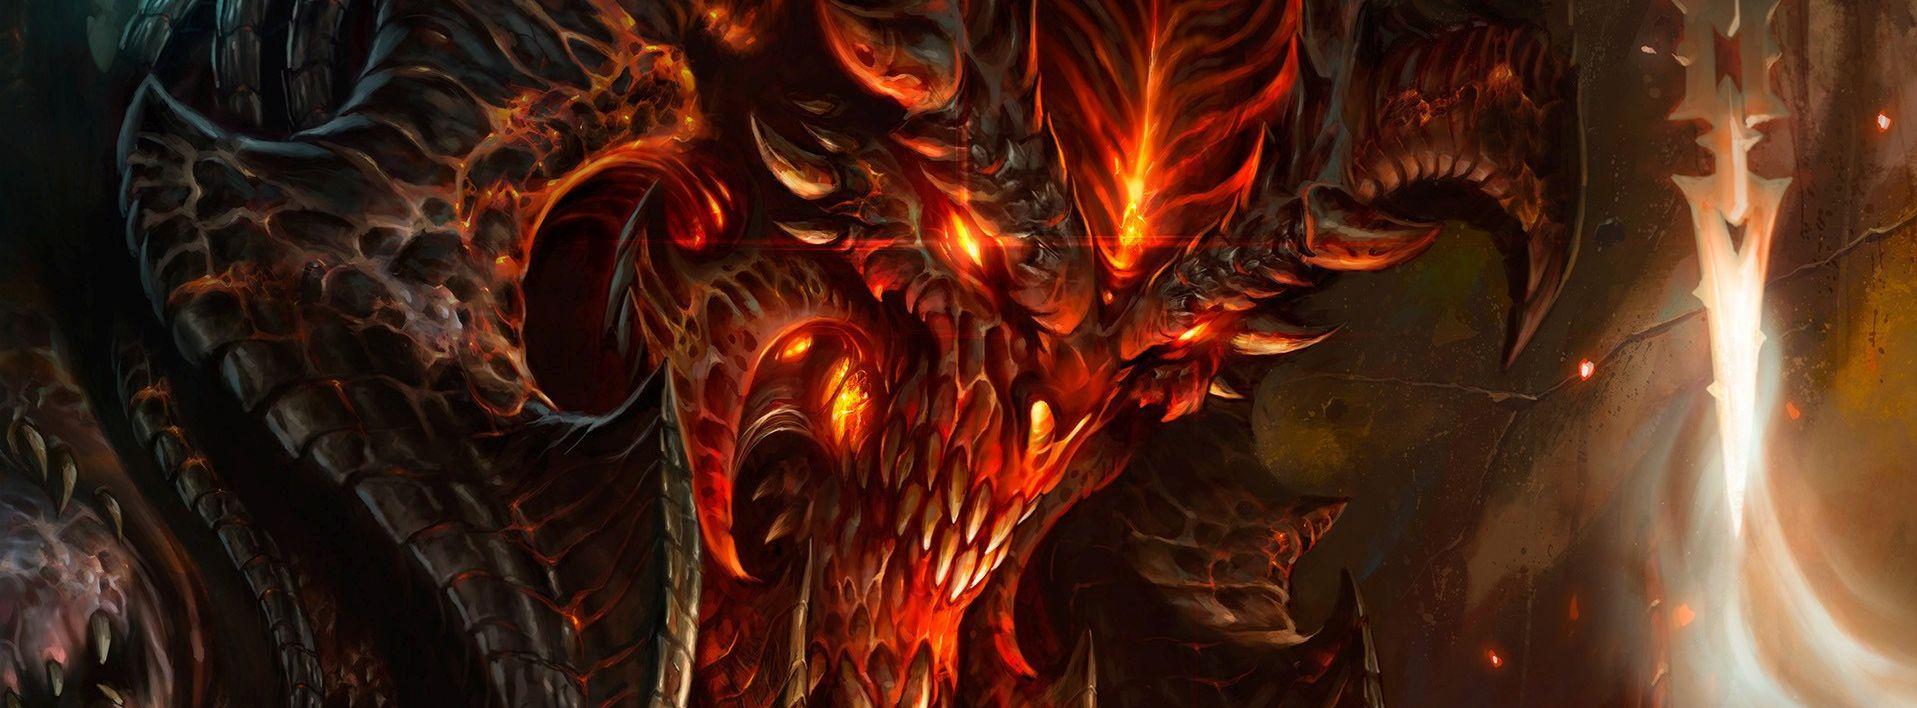 Diablo III Reaches 15 Million Copies Sold